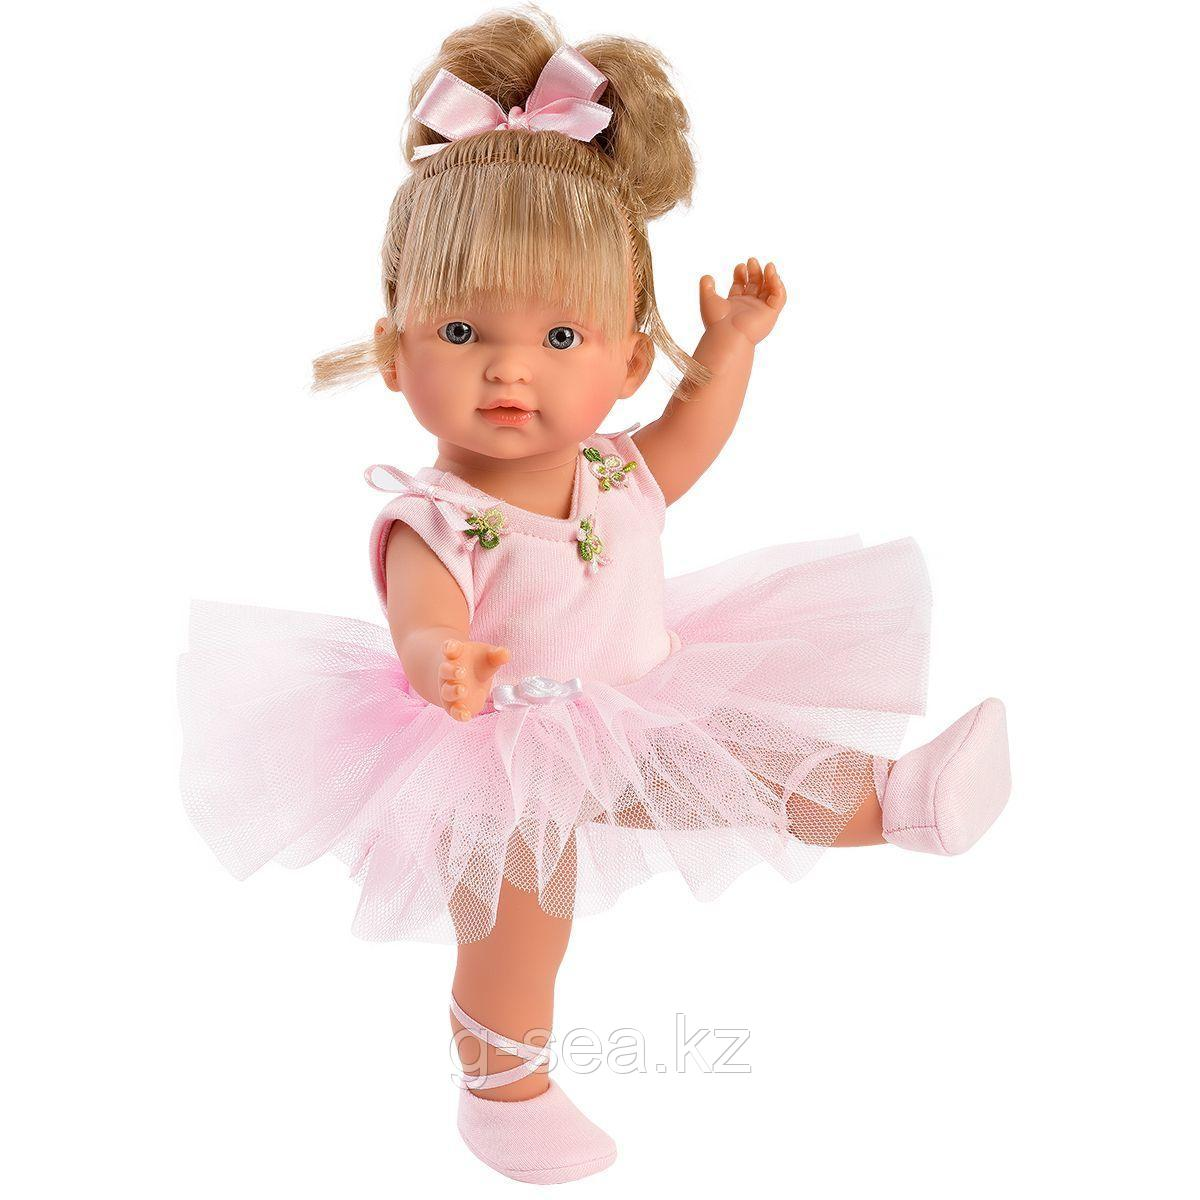 LLORENS: Кукла Валерия 28 см., блондинка балерина - фото 1